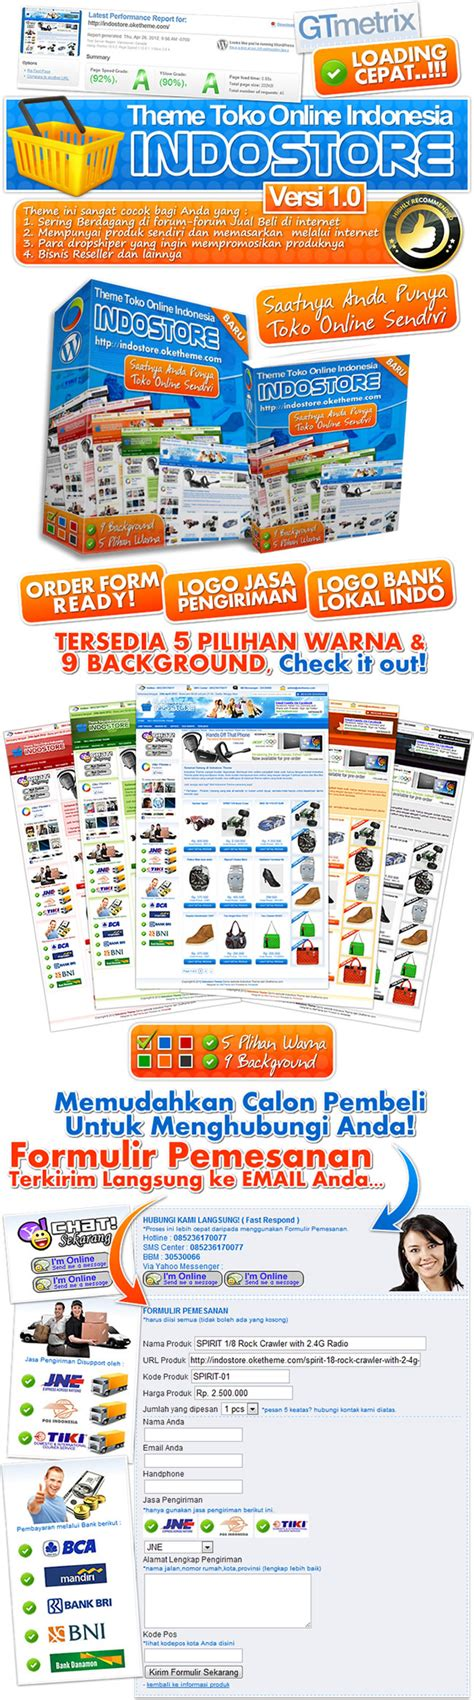 Theme Template Toko Indostore webawang tips trik komputer software android